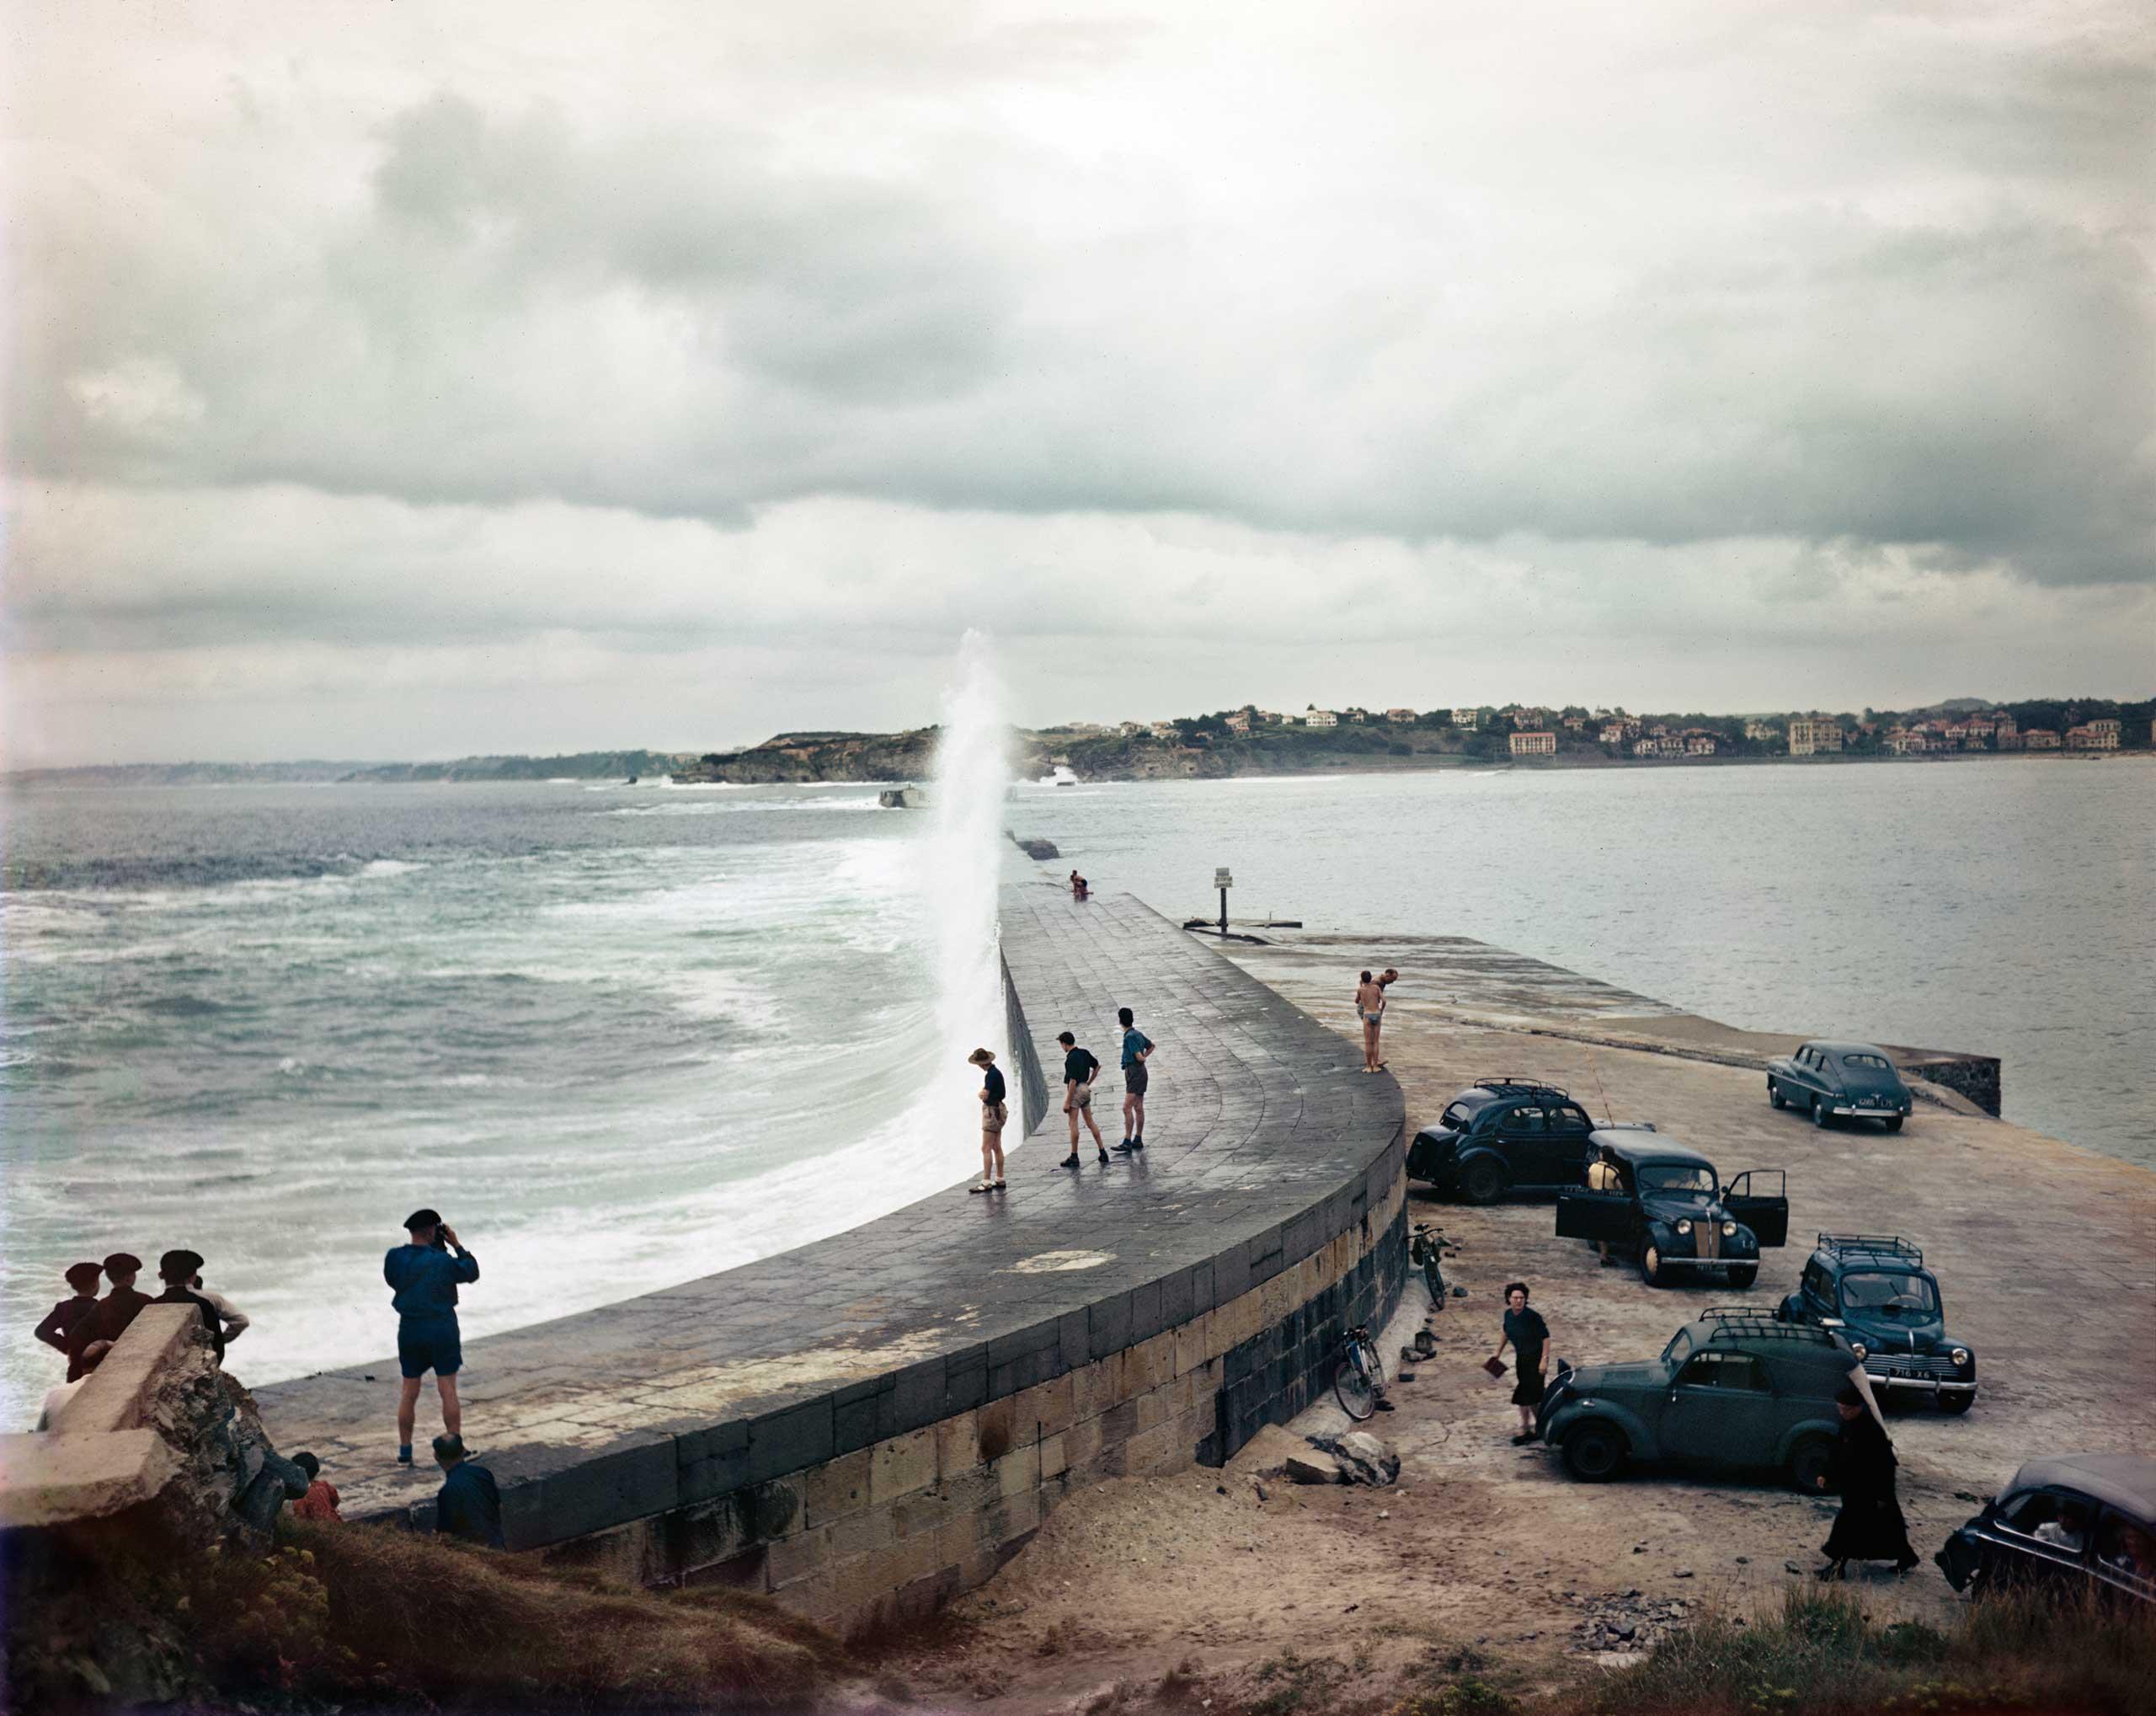 Jetty, Biarritz, France, Aug. 1951.